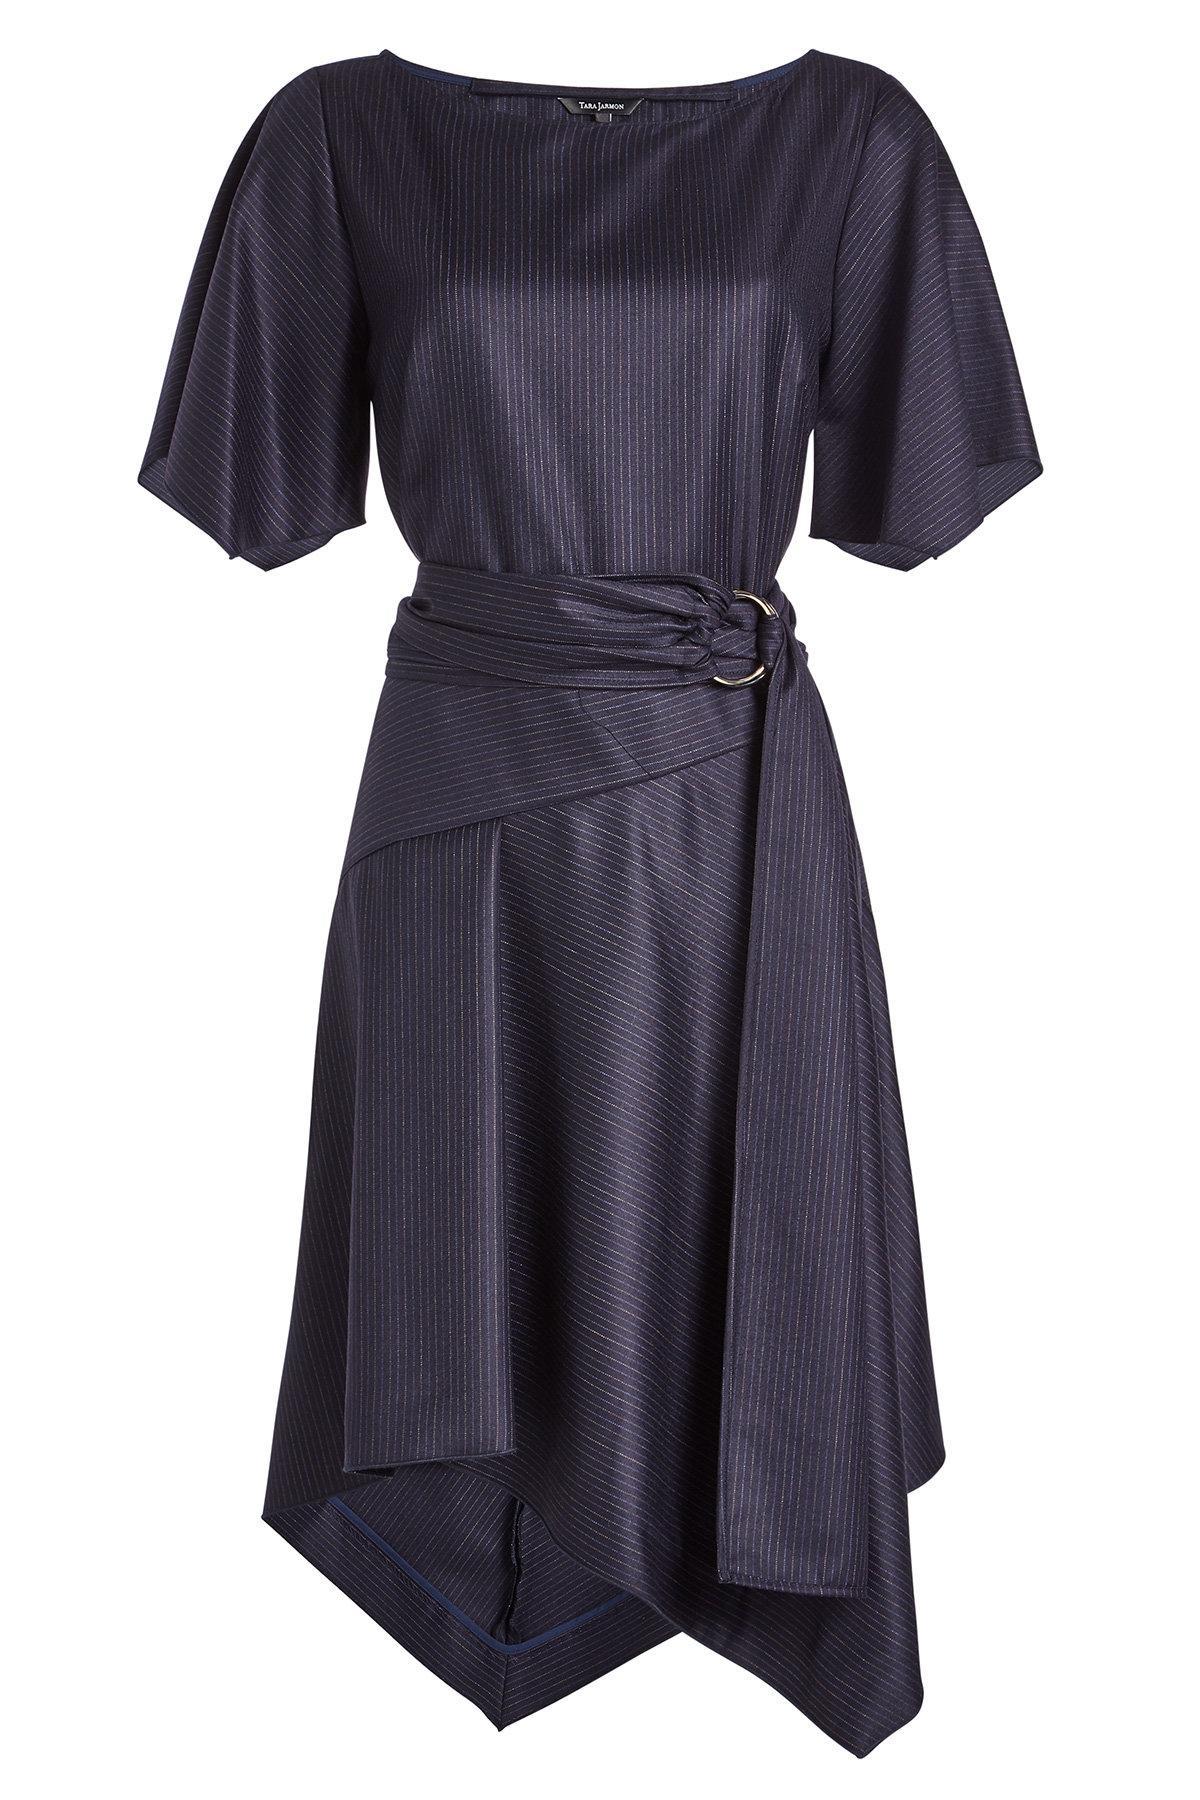 Tara Jarmon Asymmetric Virgin Wool Dress In Blue